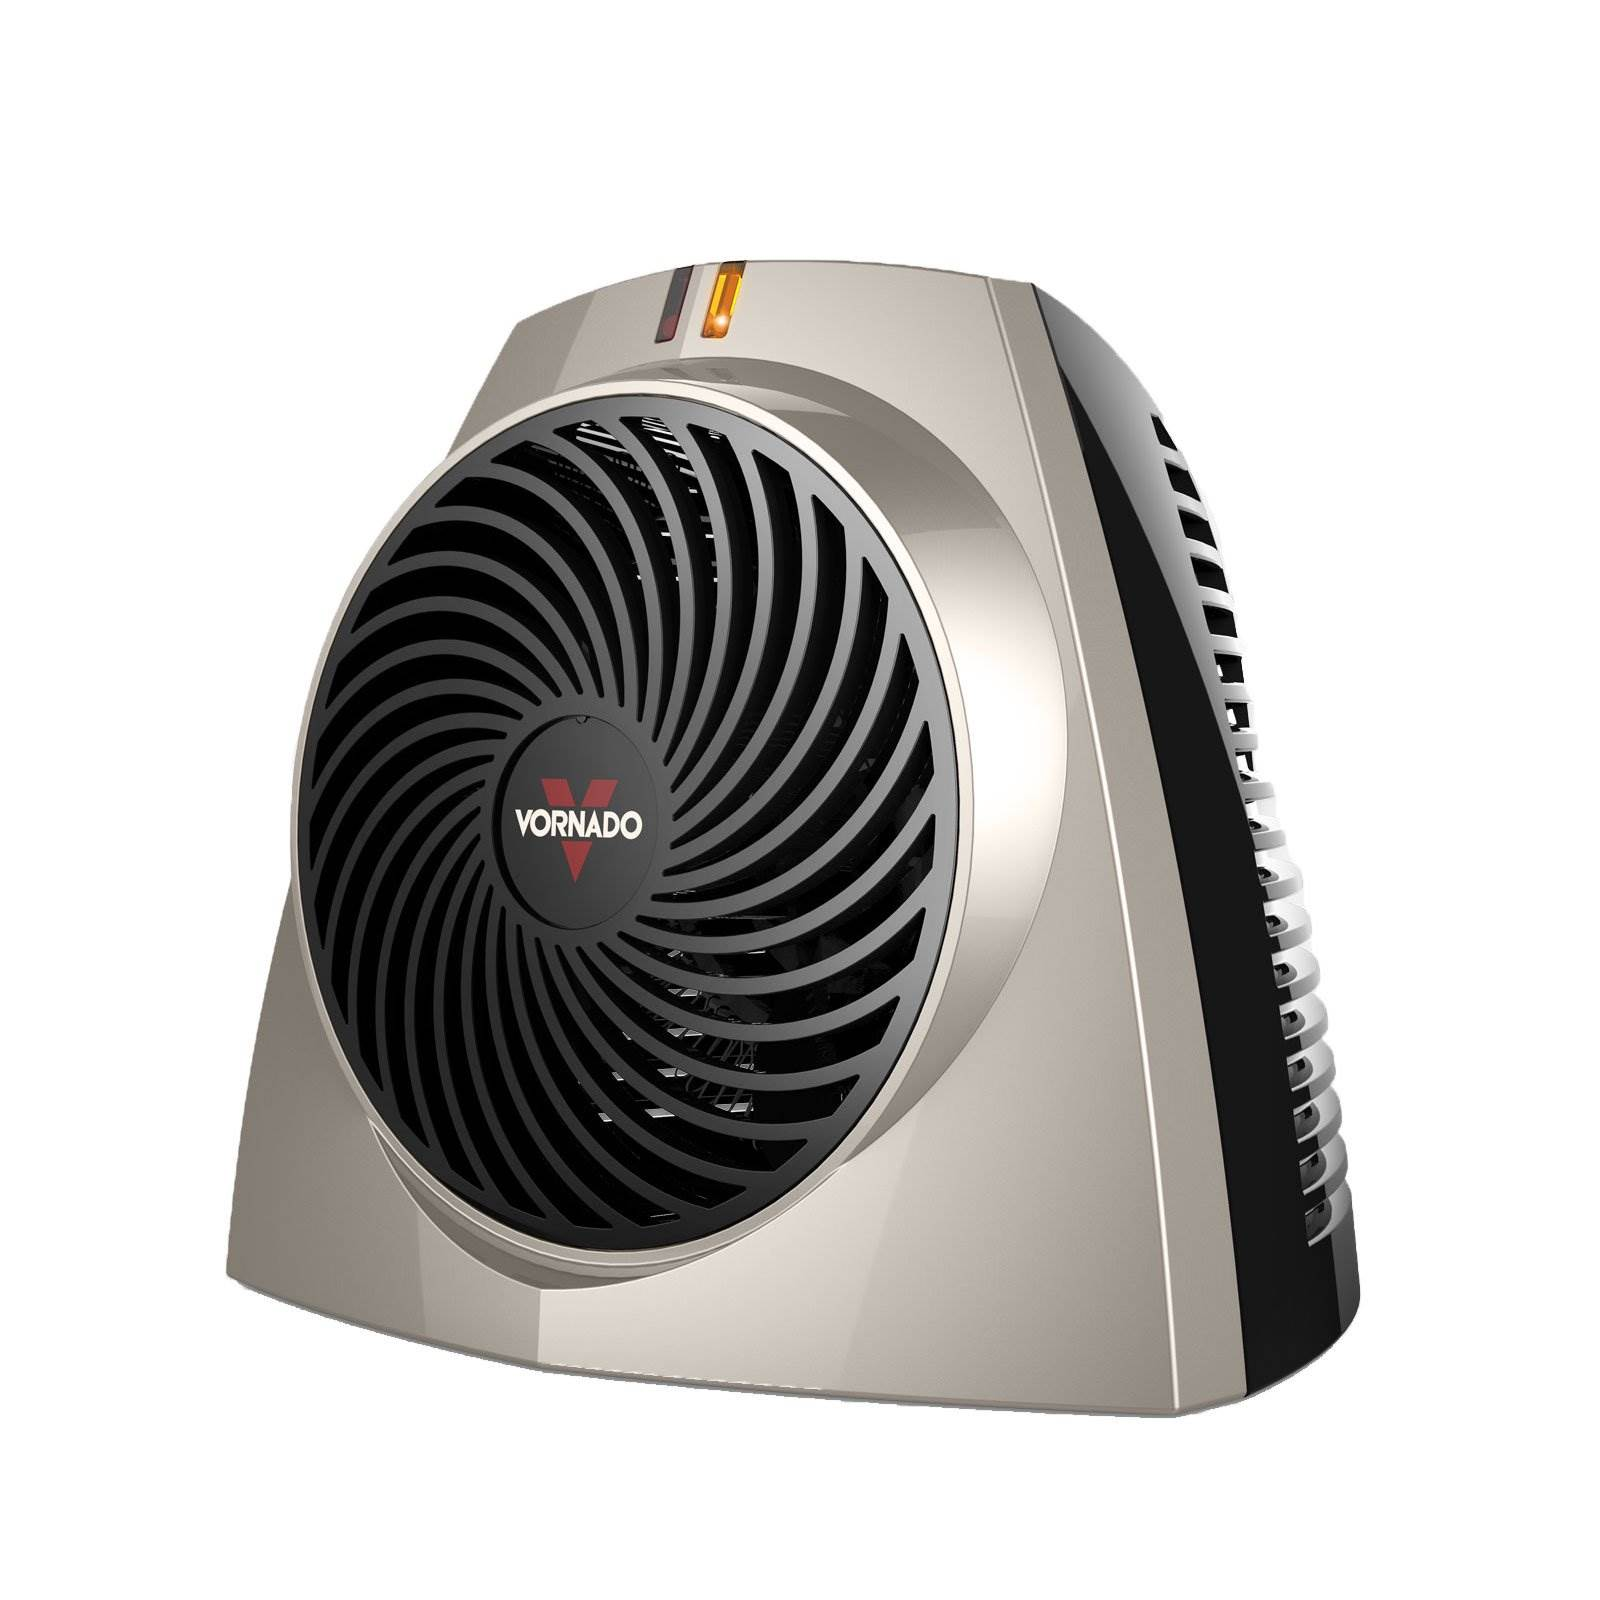 Vornado Vh203 75 Square Foot Personal Space Heater With Vortex Circulation Walmart Com Walmart Com